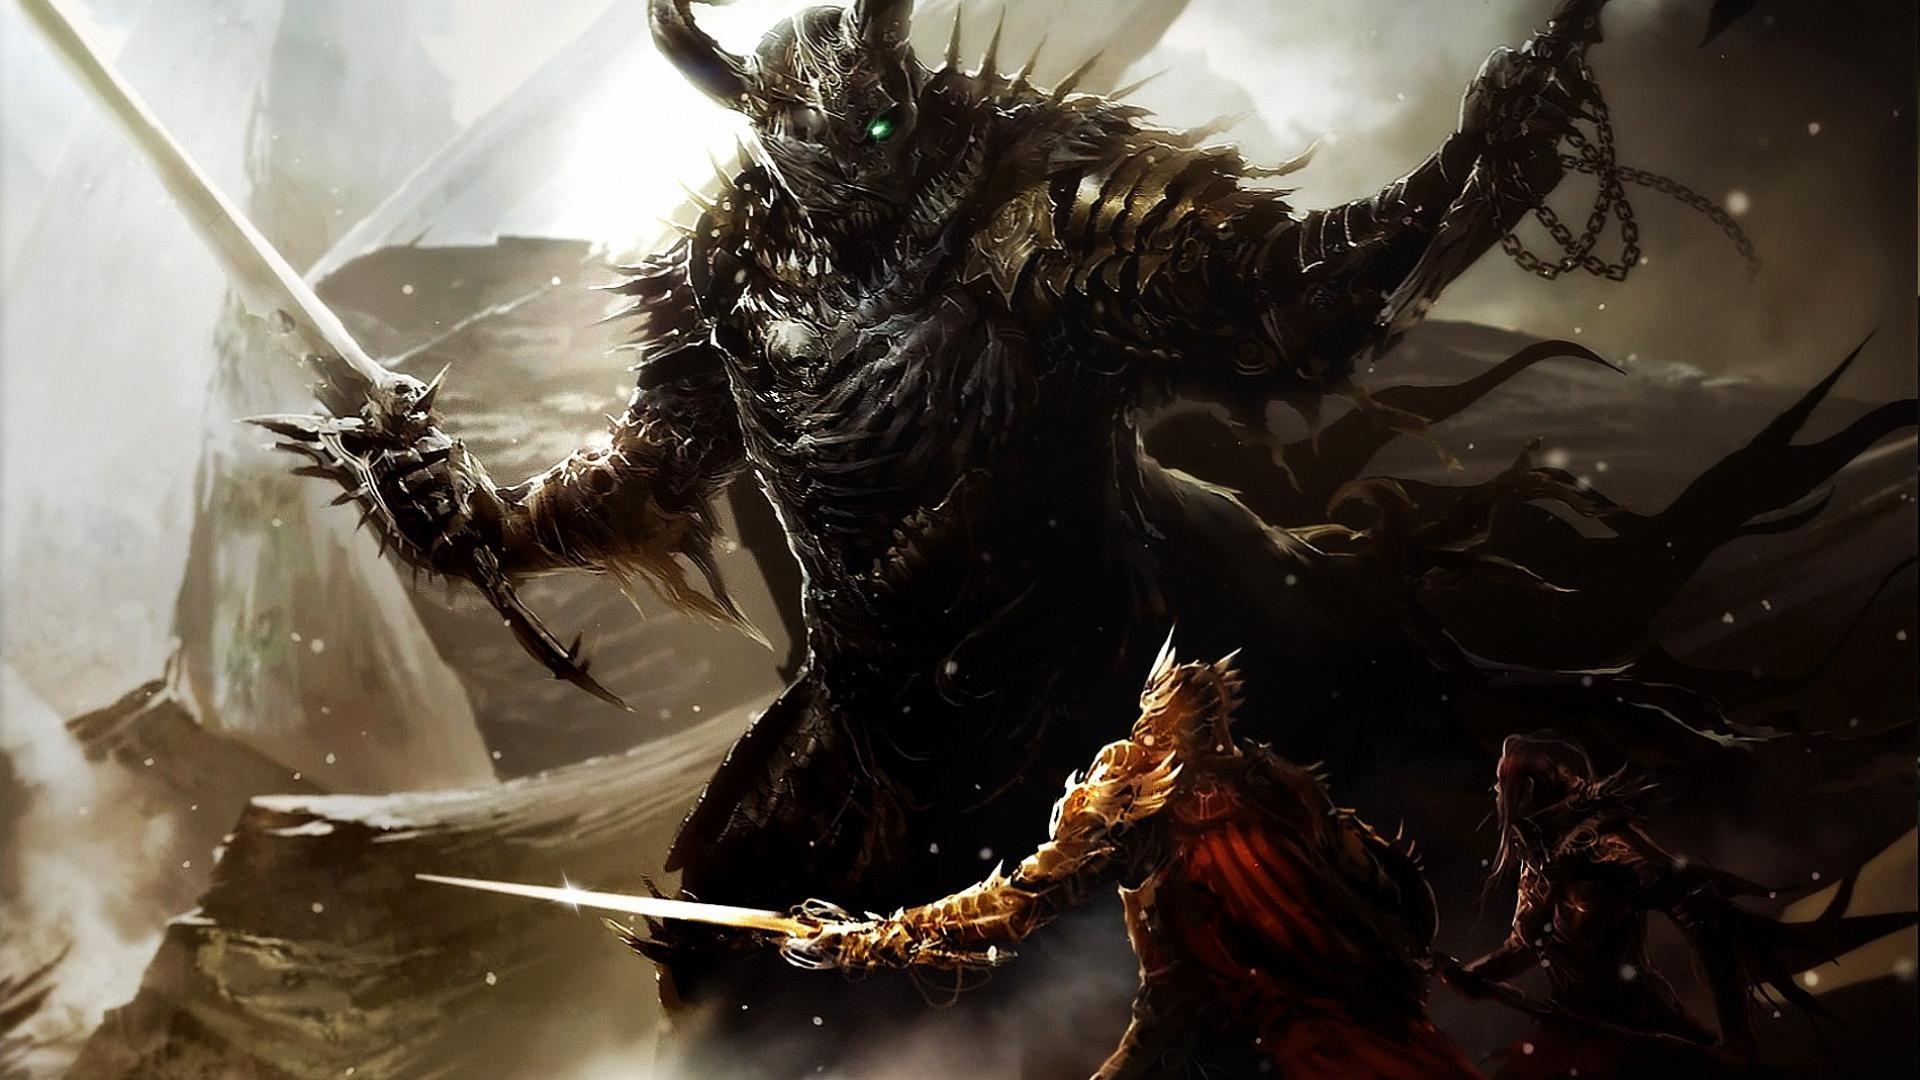 Epic Monster Fight #Epic #Fight #Games #gaming #Monster #wallpaper #